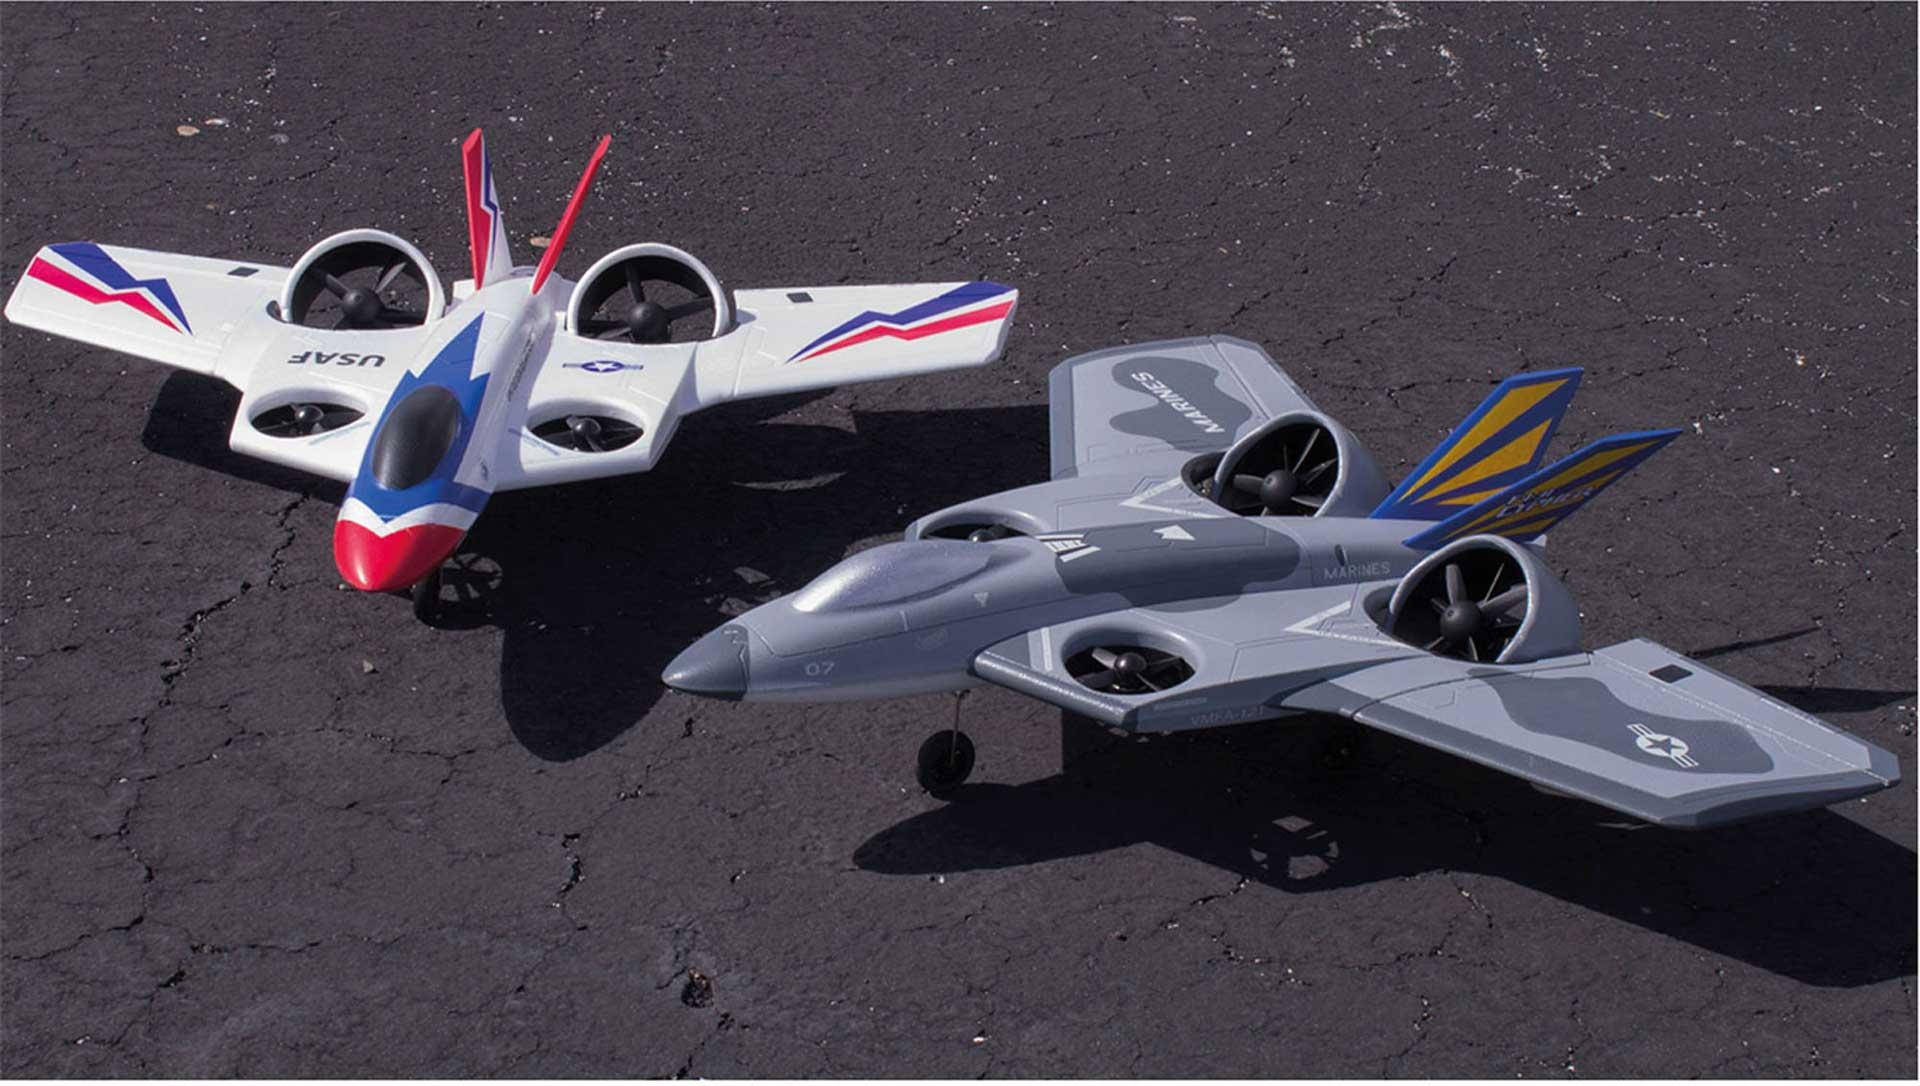 PREMIER AIRCRAFT FV-31 CYPHER VTOL SUPER PNP ROT/WEISS/ BLAU